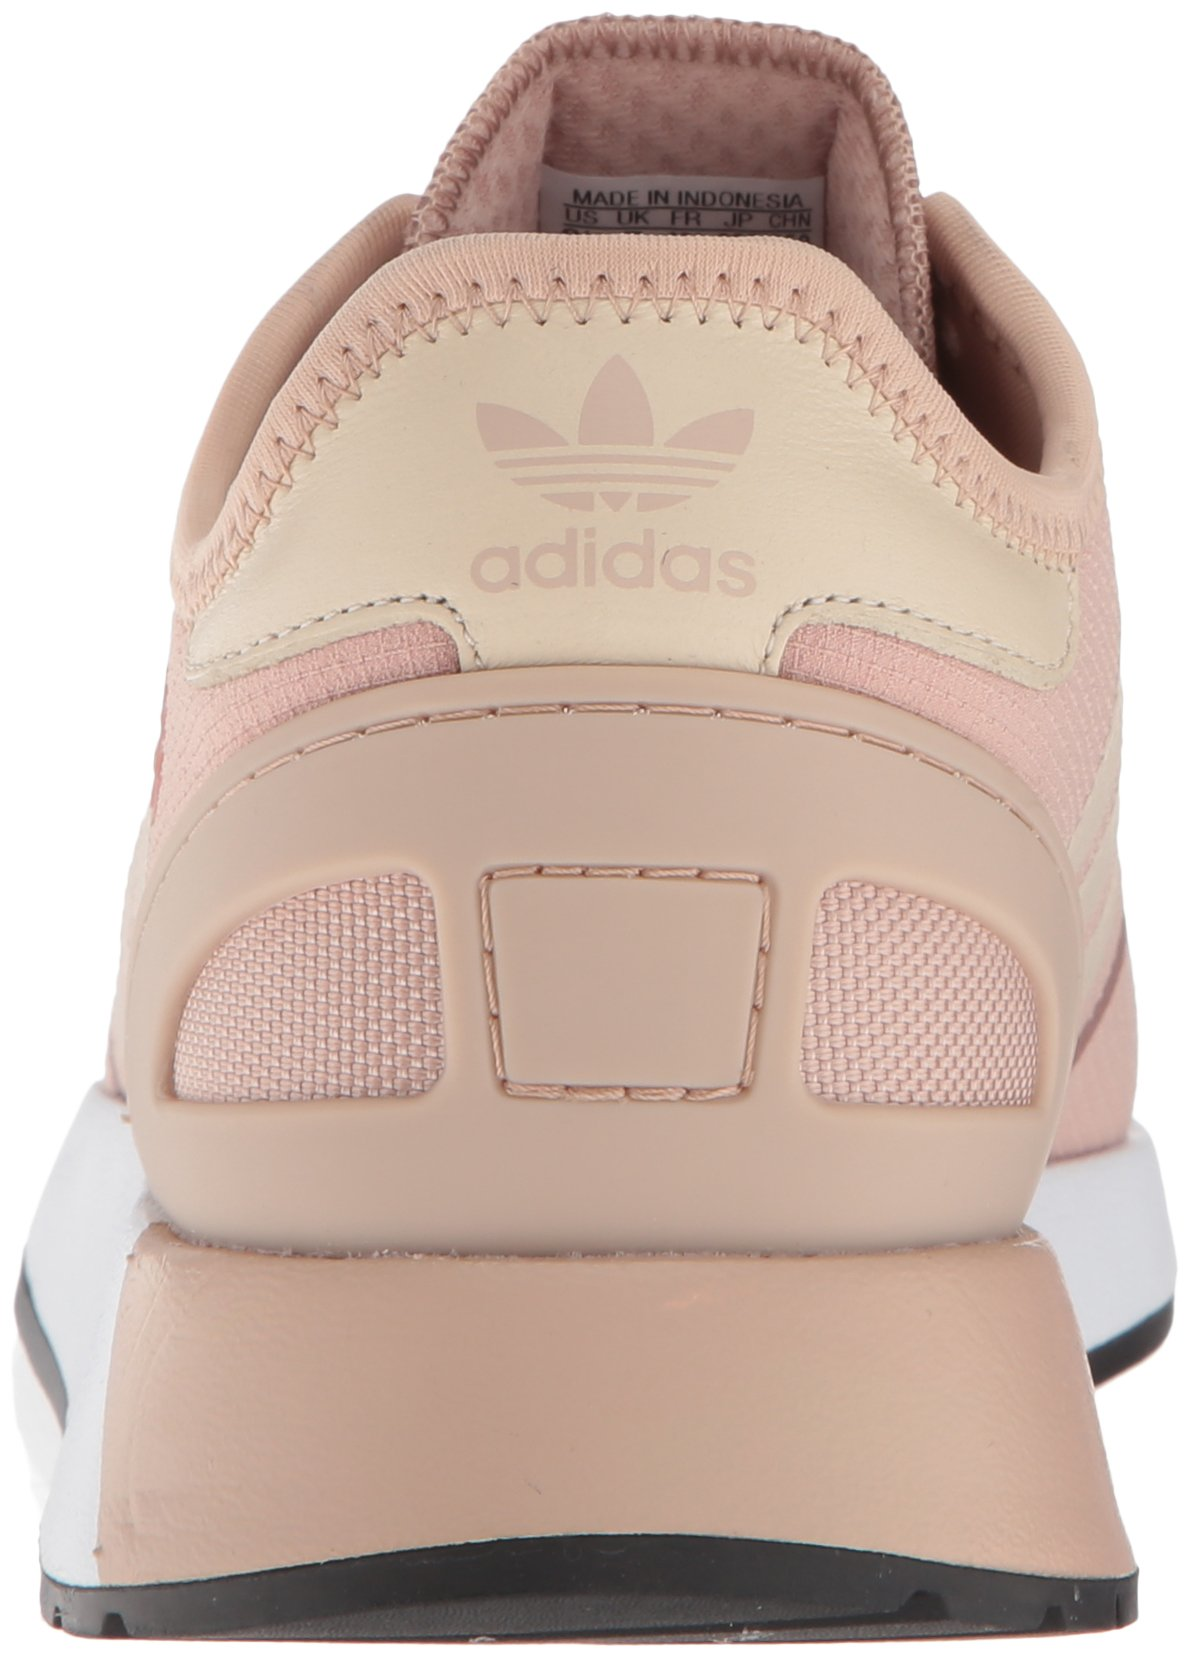 adidas Originals Women's Iniki Runner CLS W, Ash Pearl/Linen/White, 5 M US by adidas Originals (Image #2)